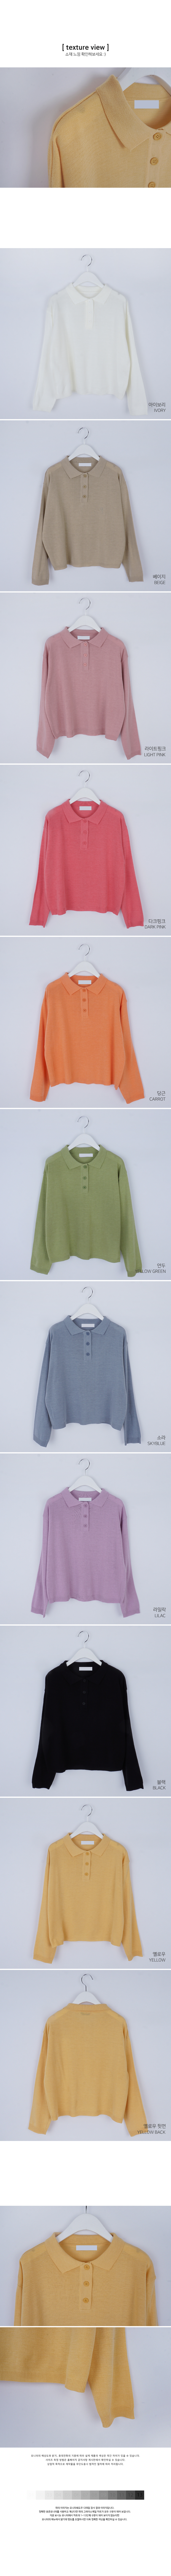 Onion collar knit